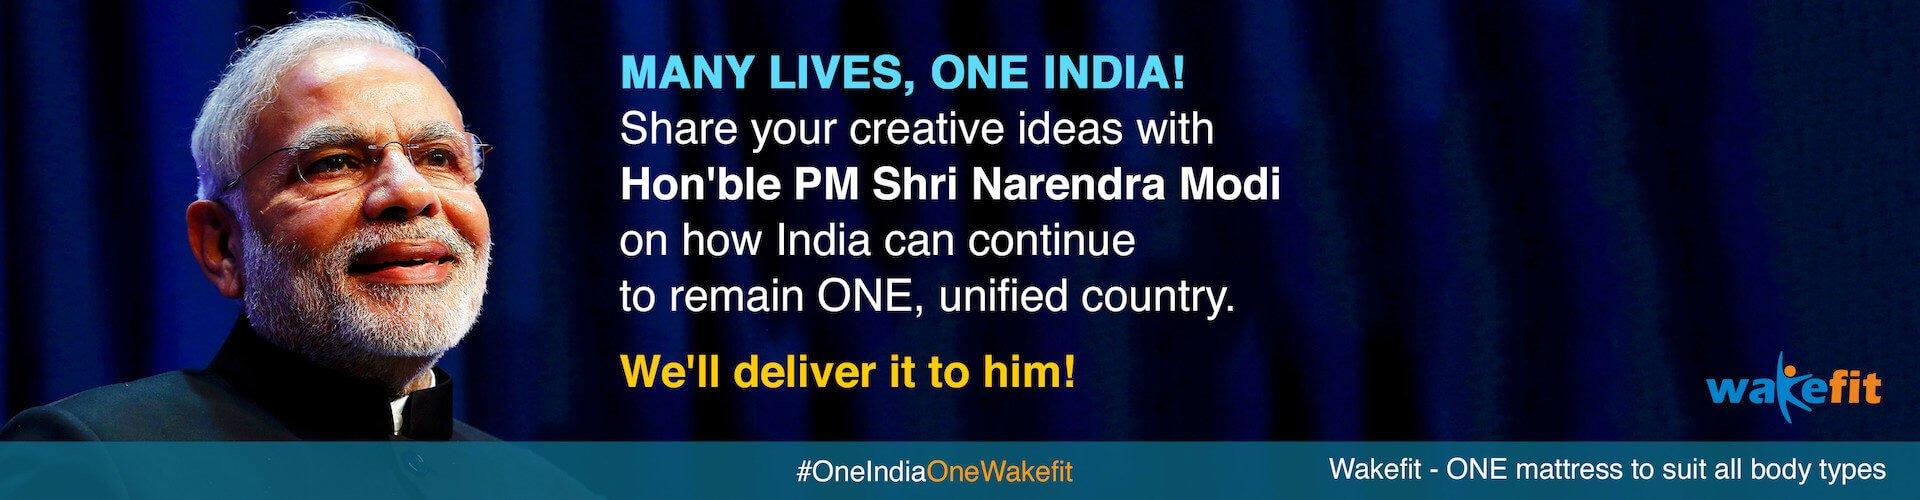 #OneIndiaOneWakefit